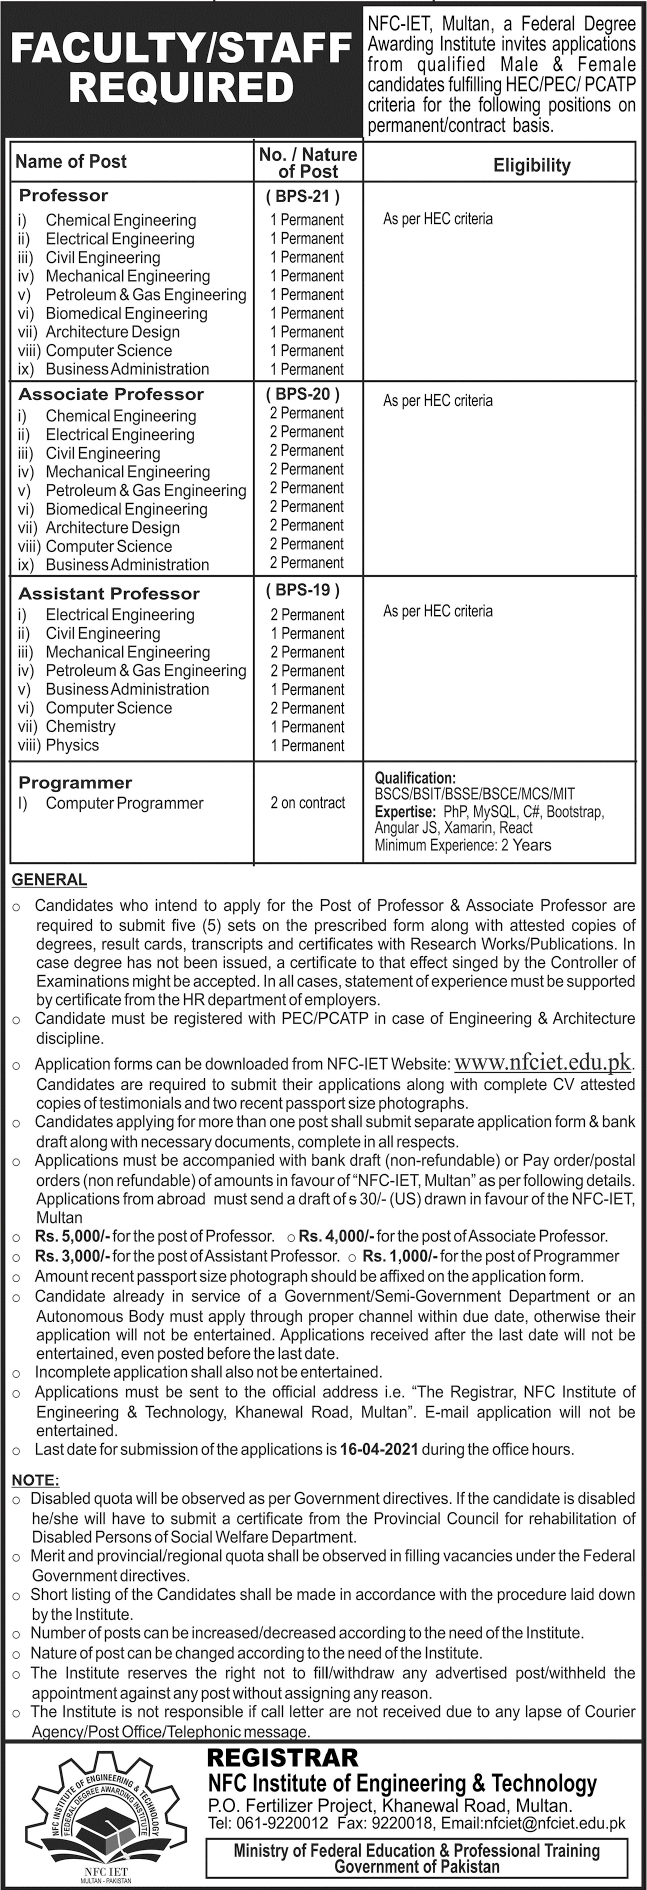 NFC Institute of Engineering & Technology Jobs in Multan